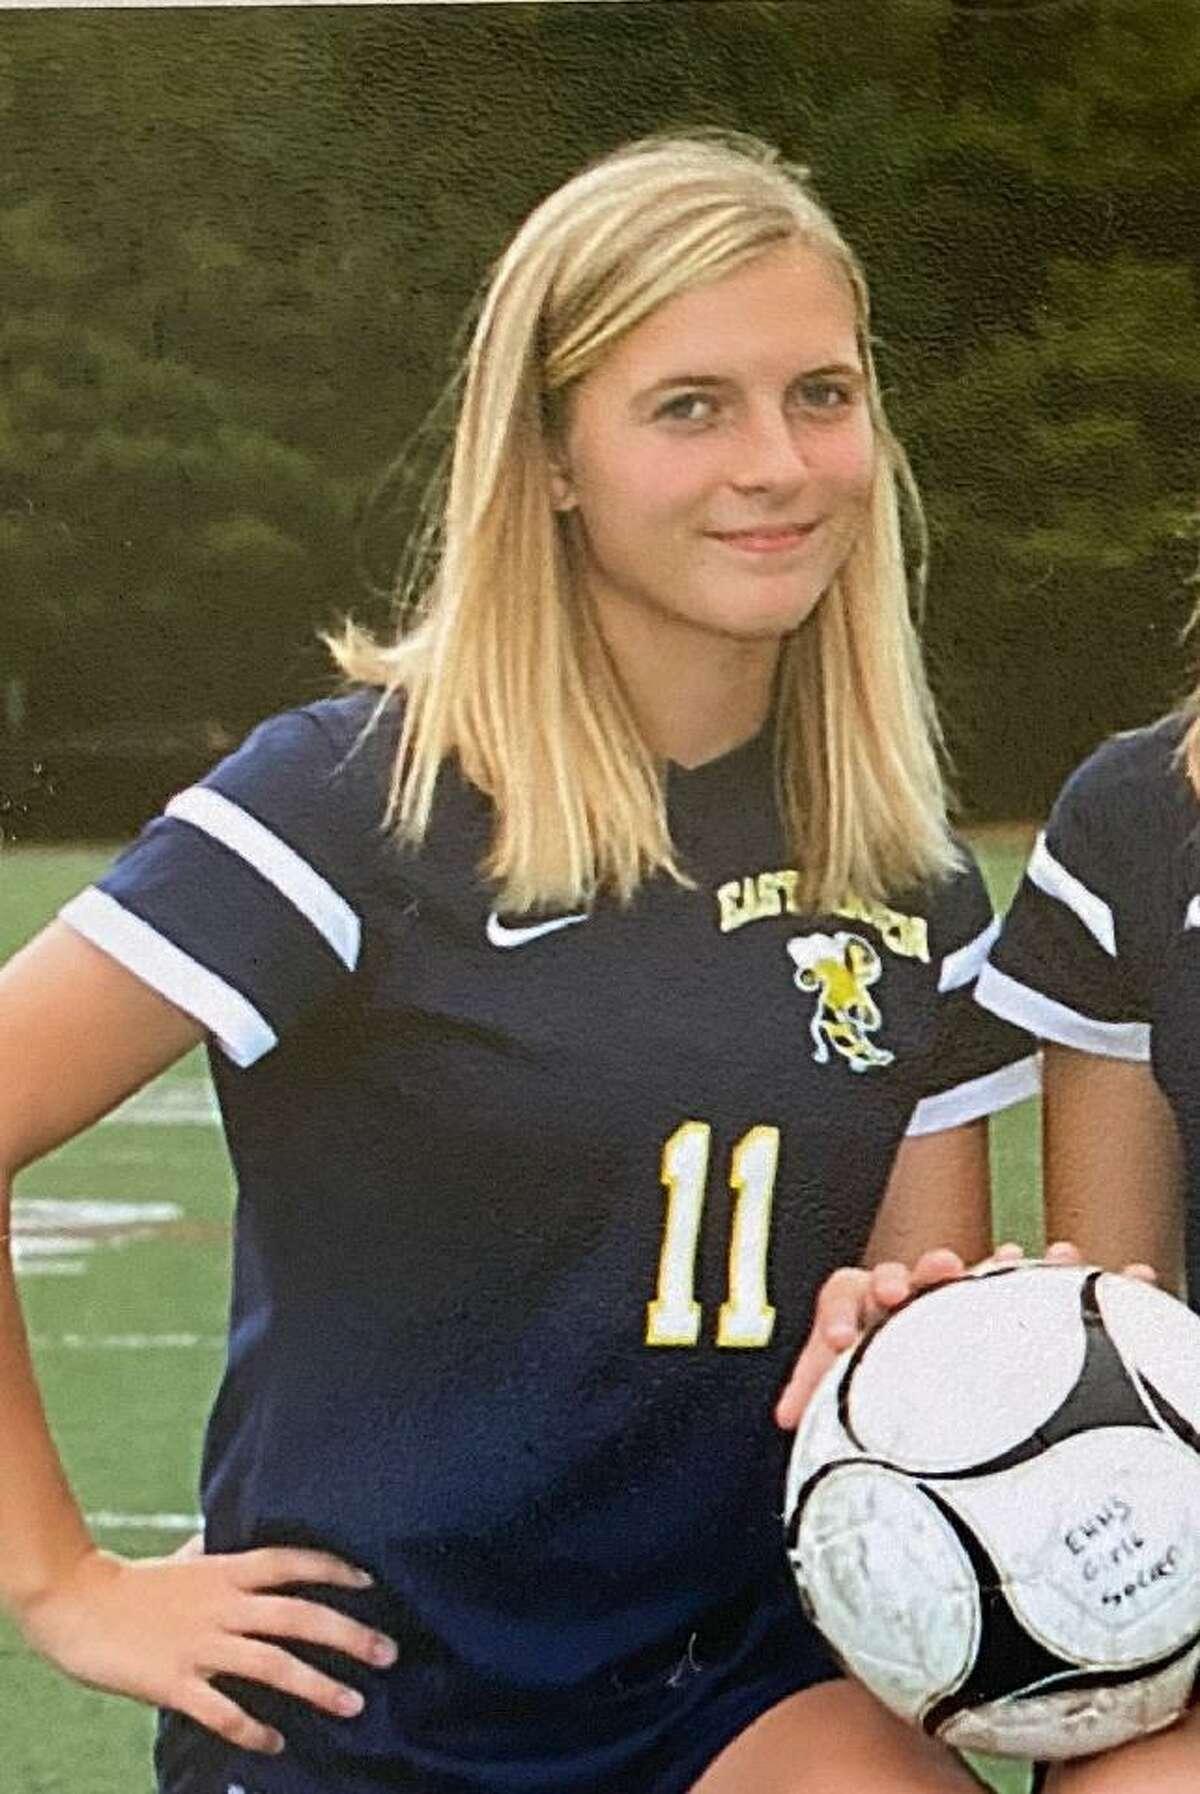 Emily Pycela scored four goals to help East Haven defeat Wilbur Cross.